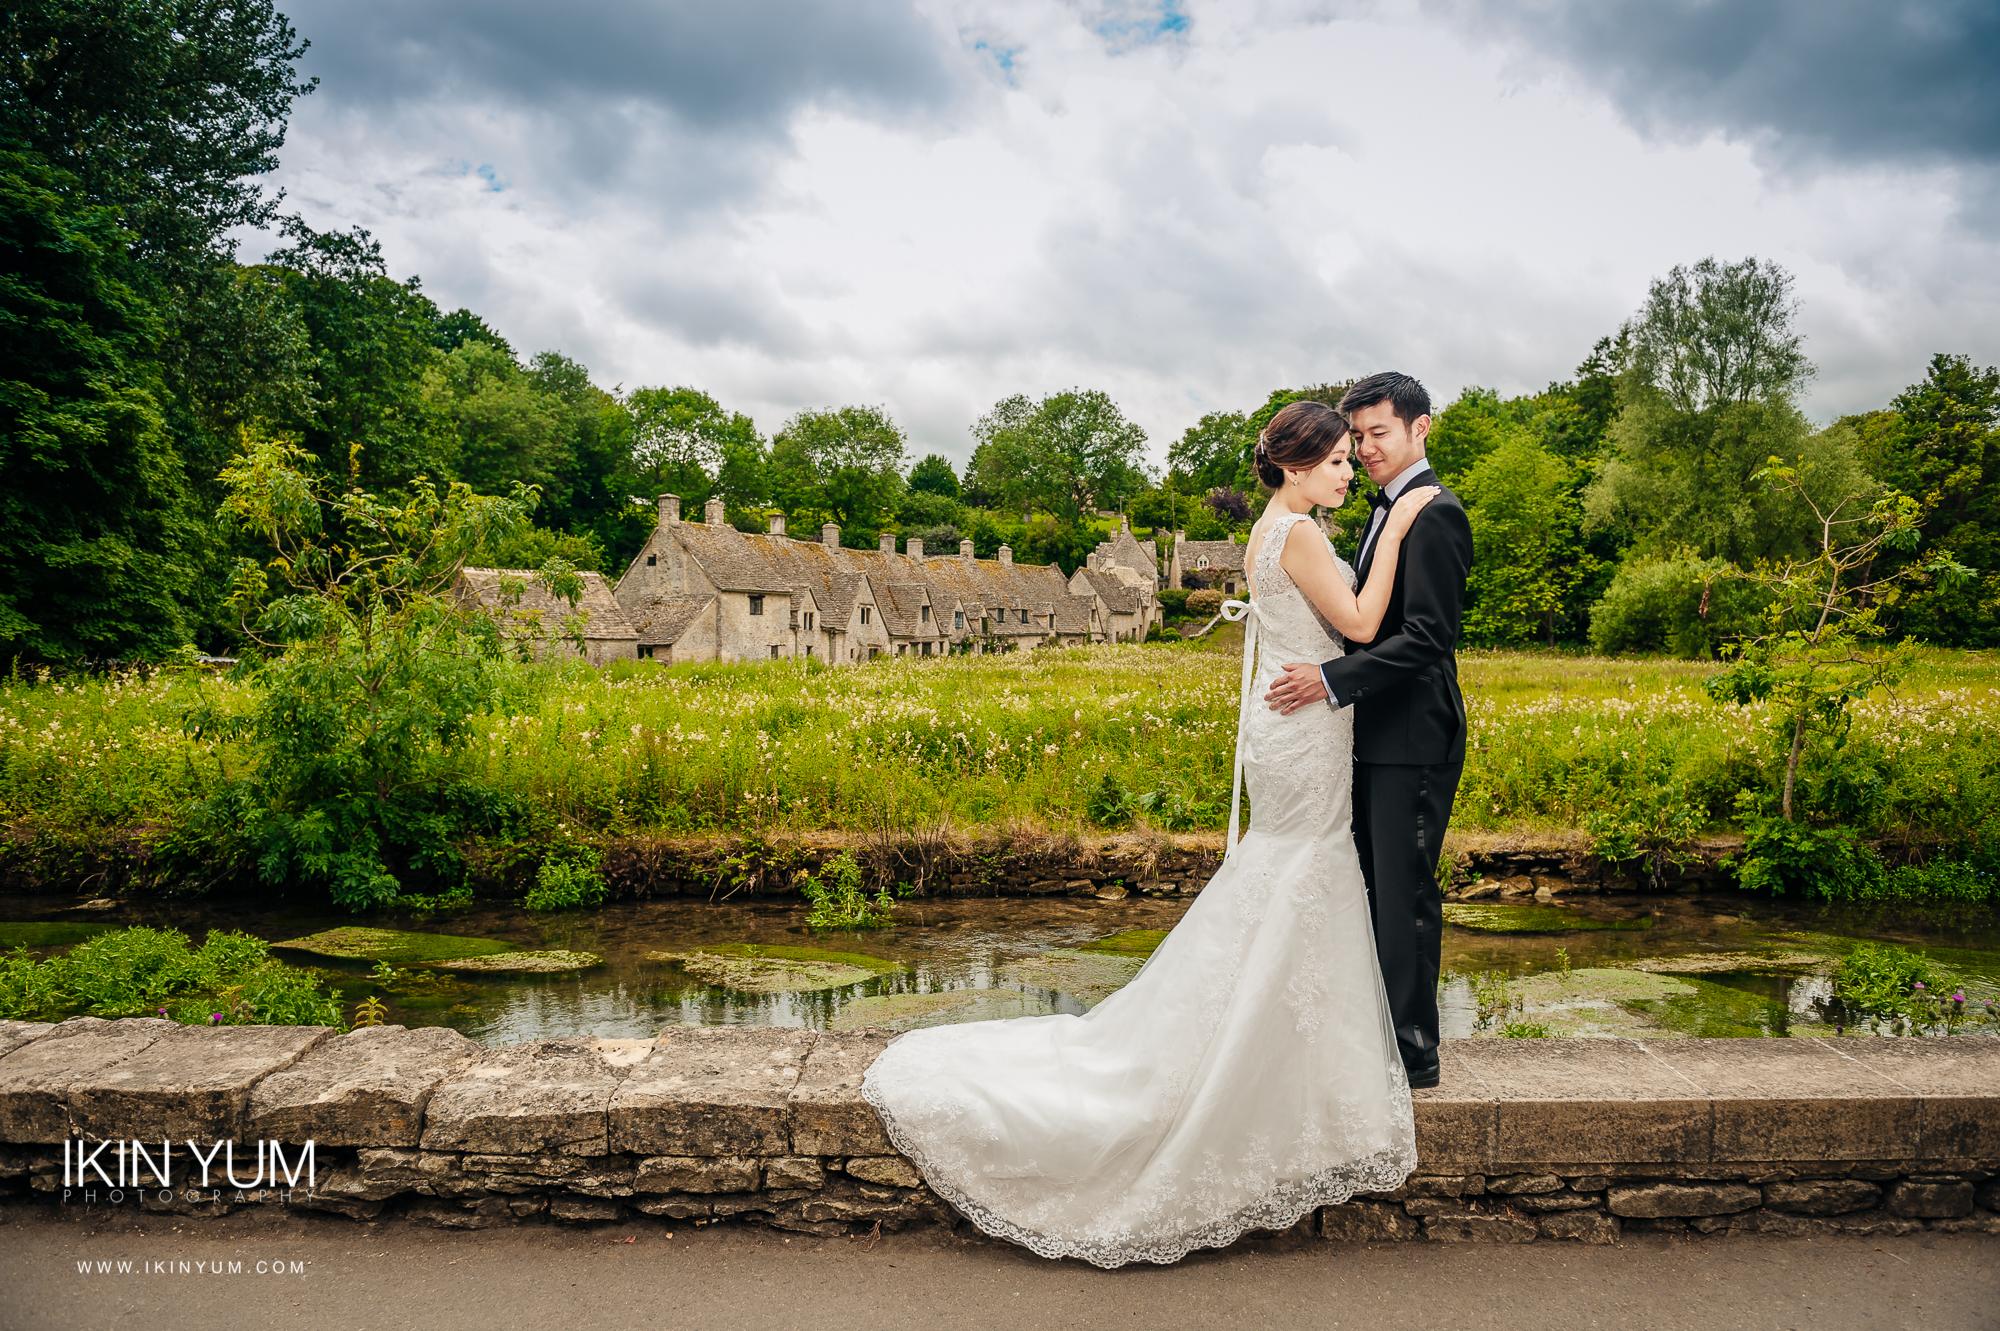 Carmen & Dennis Pre-Wedding Shoot - Ikin Yum Photography-031.jpg